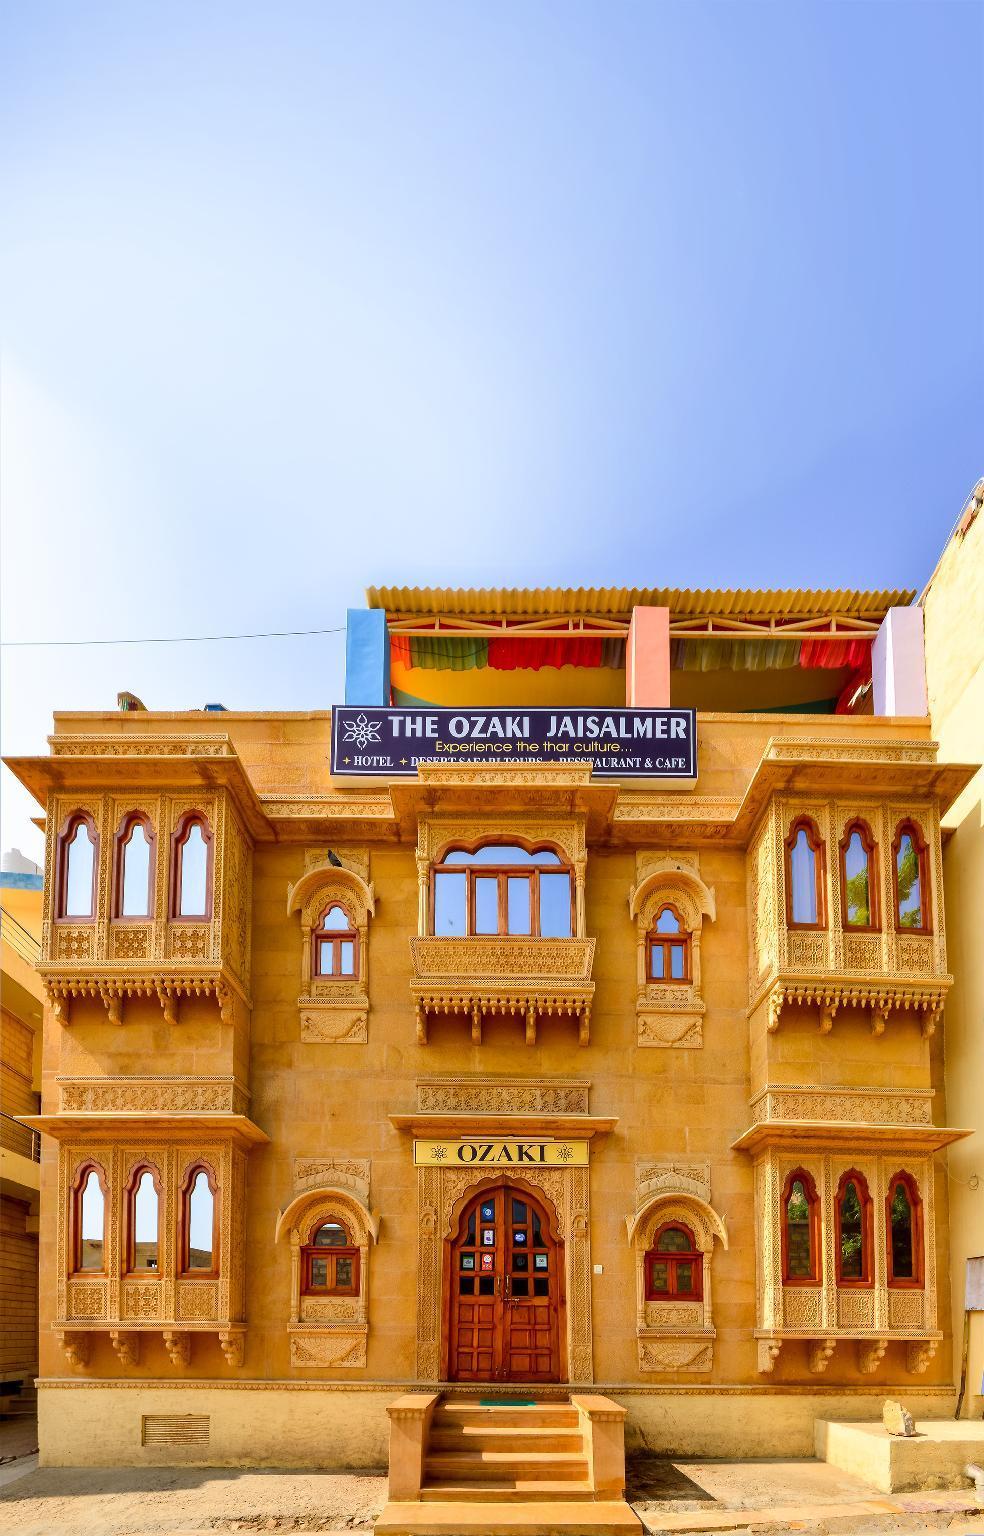 The Ozaki Jaisalmer